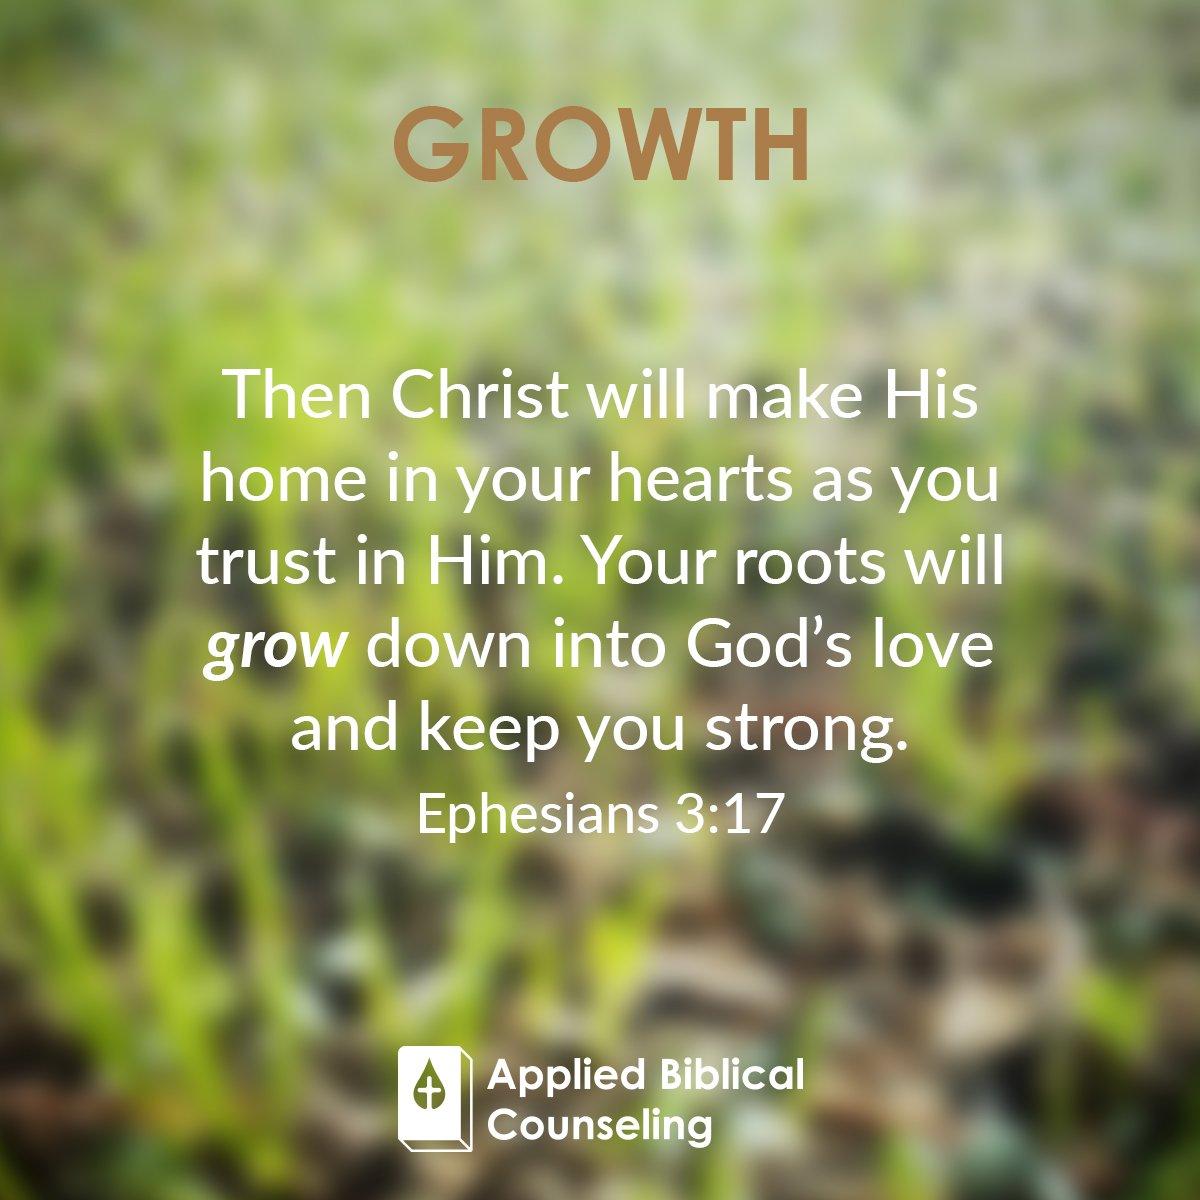 Growth 4